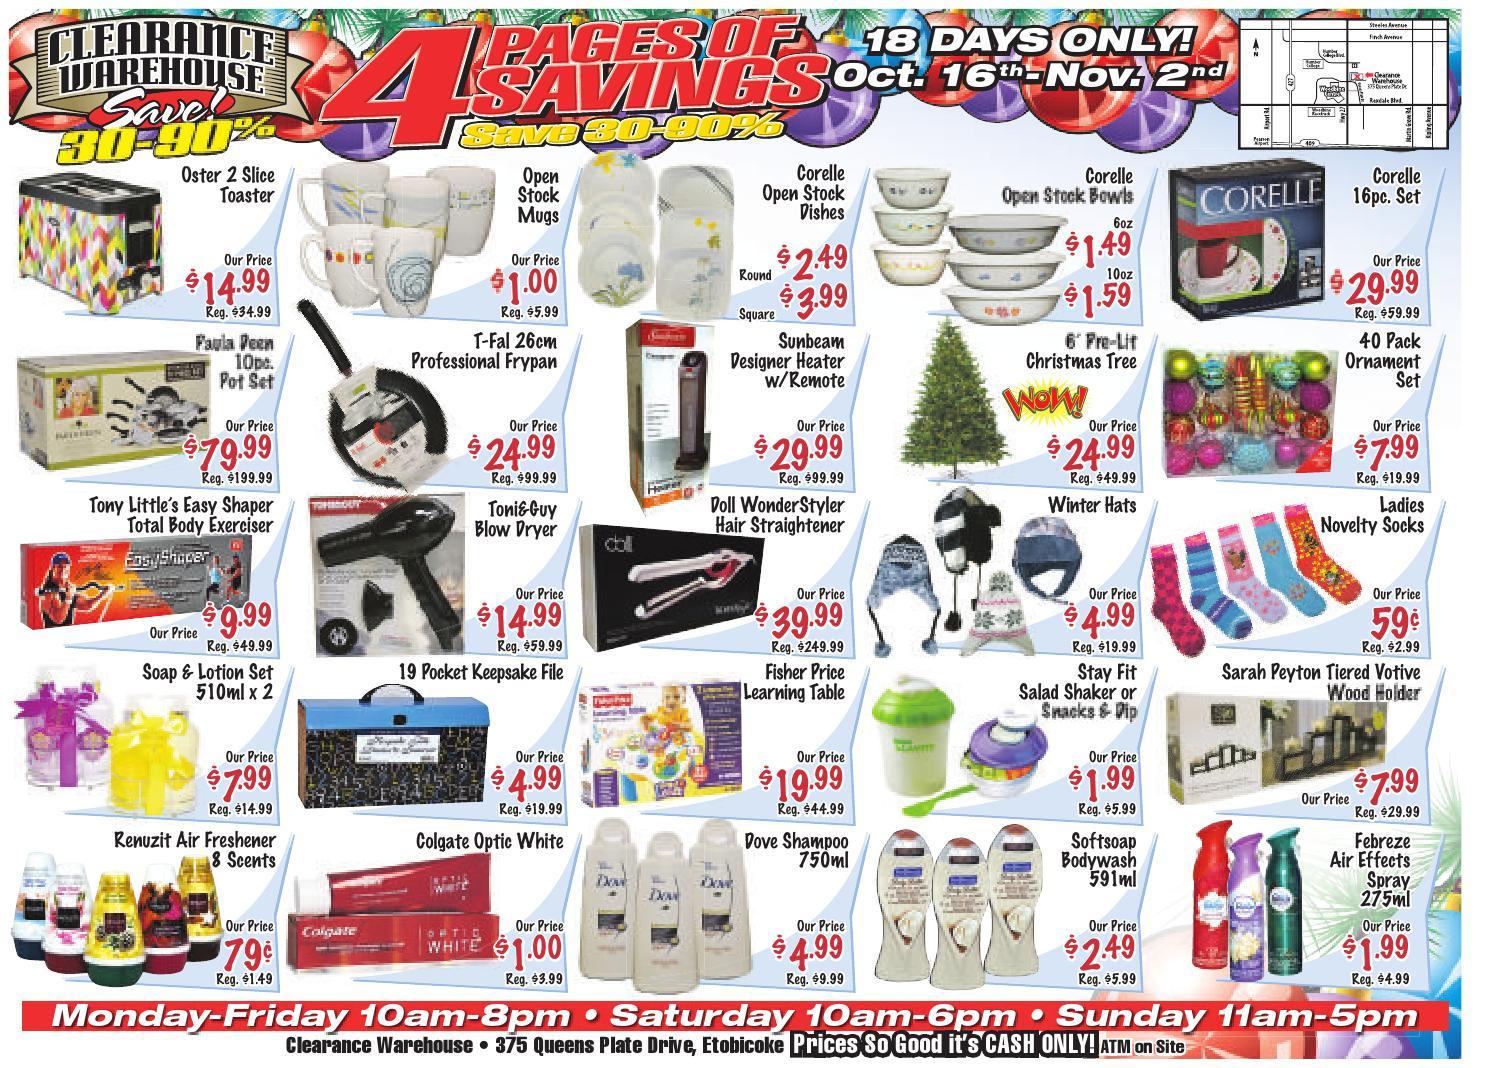 The Etobicoke Guardian October 16 2014 By Axe Deodorant Bodyspray Score 150 Ml Twin Pack Issuu